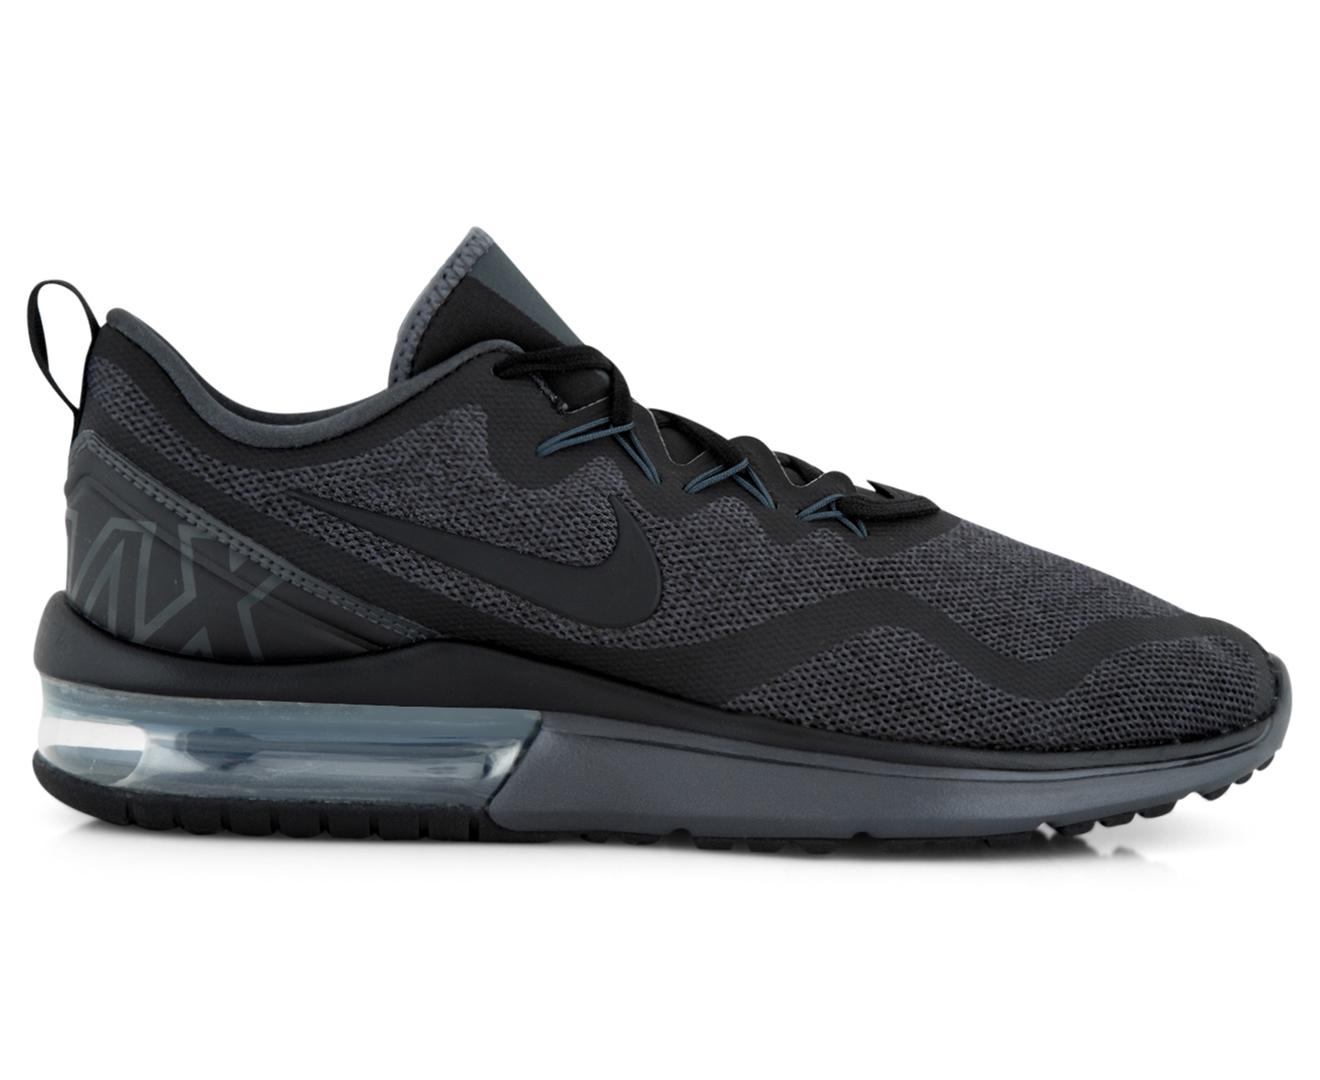 Nike Men's Air Max Fury Shoe BlackBlack Anthracite